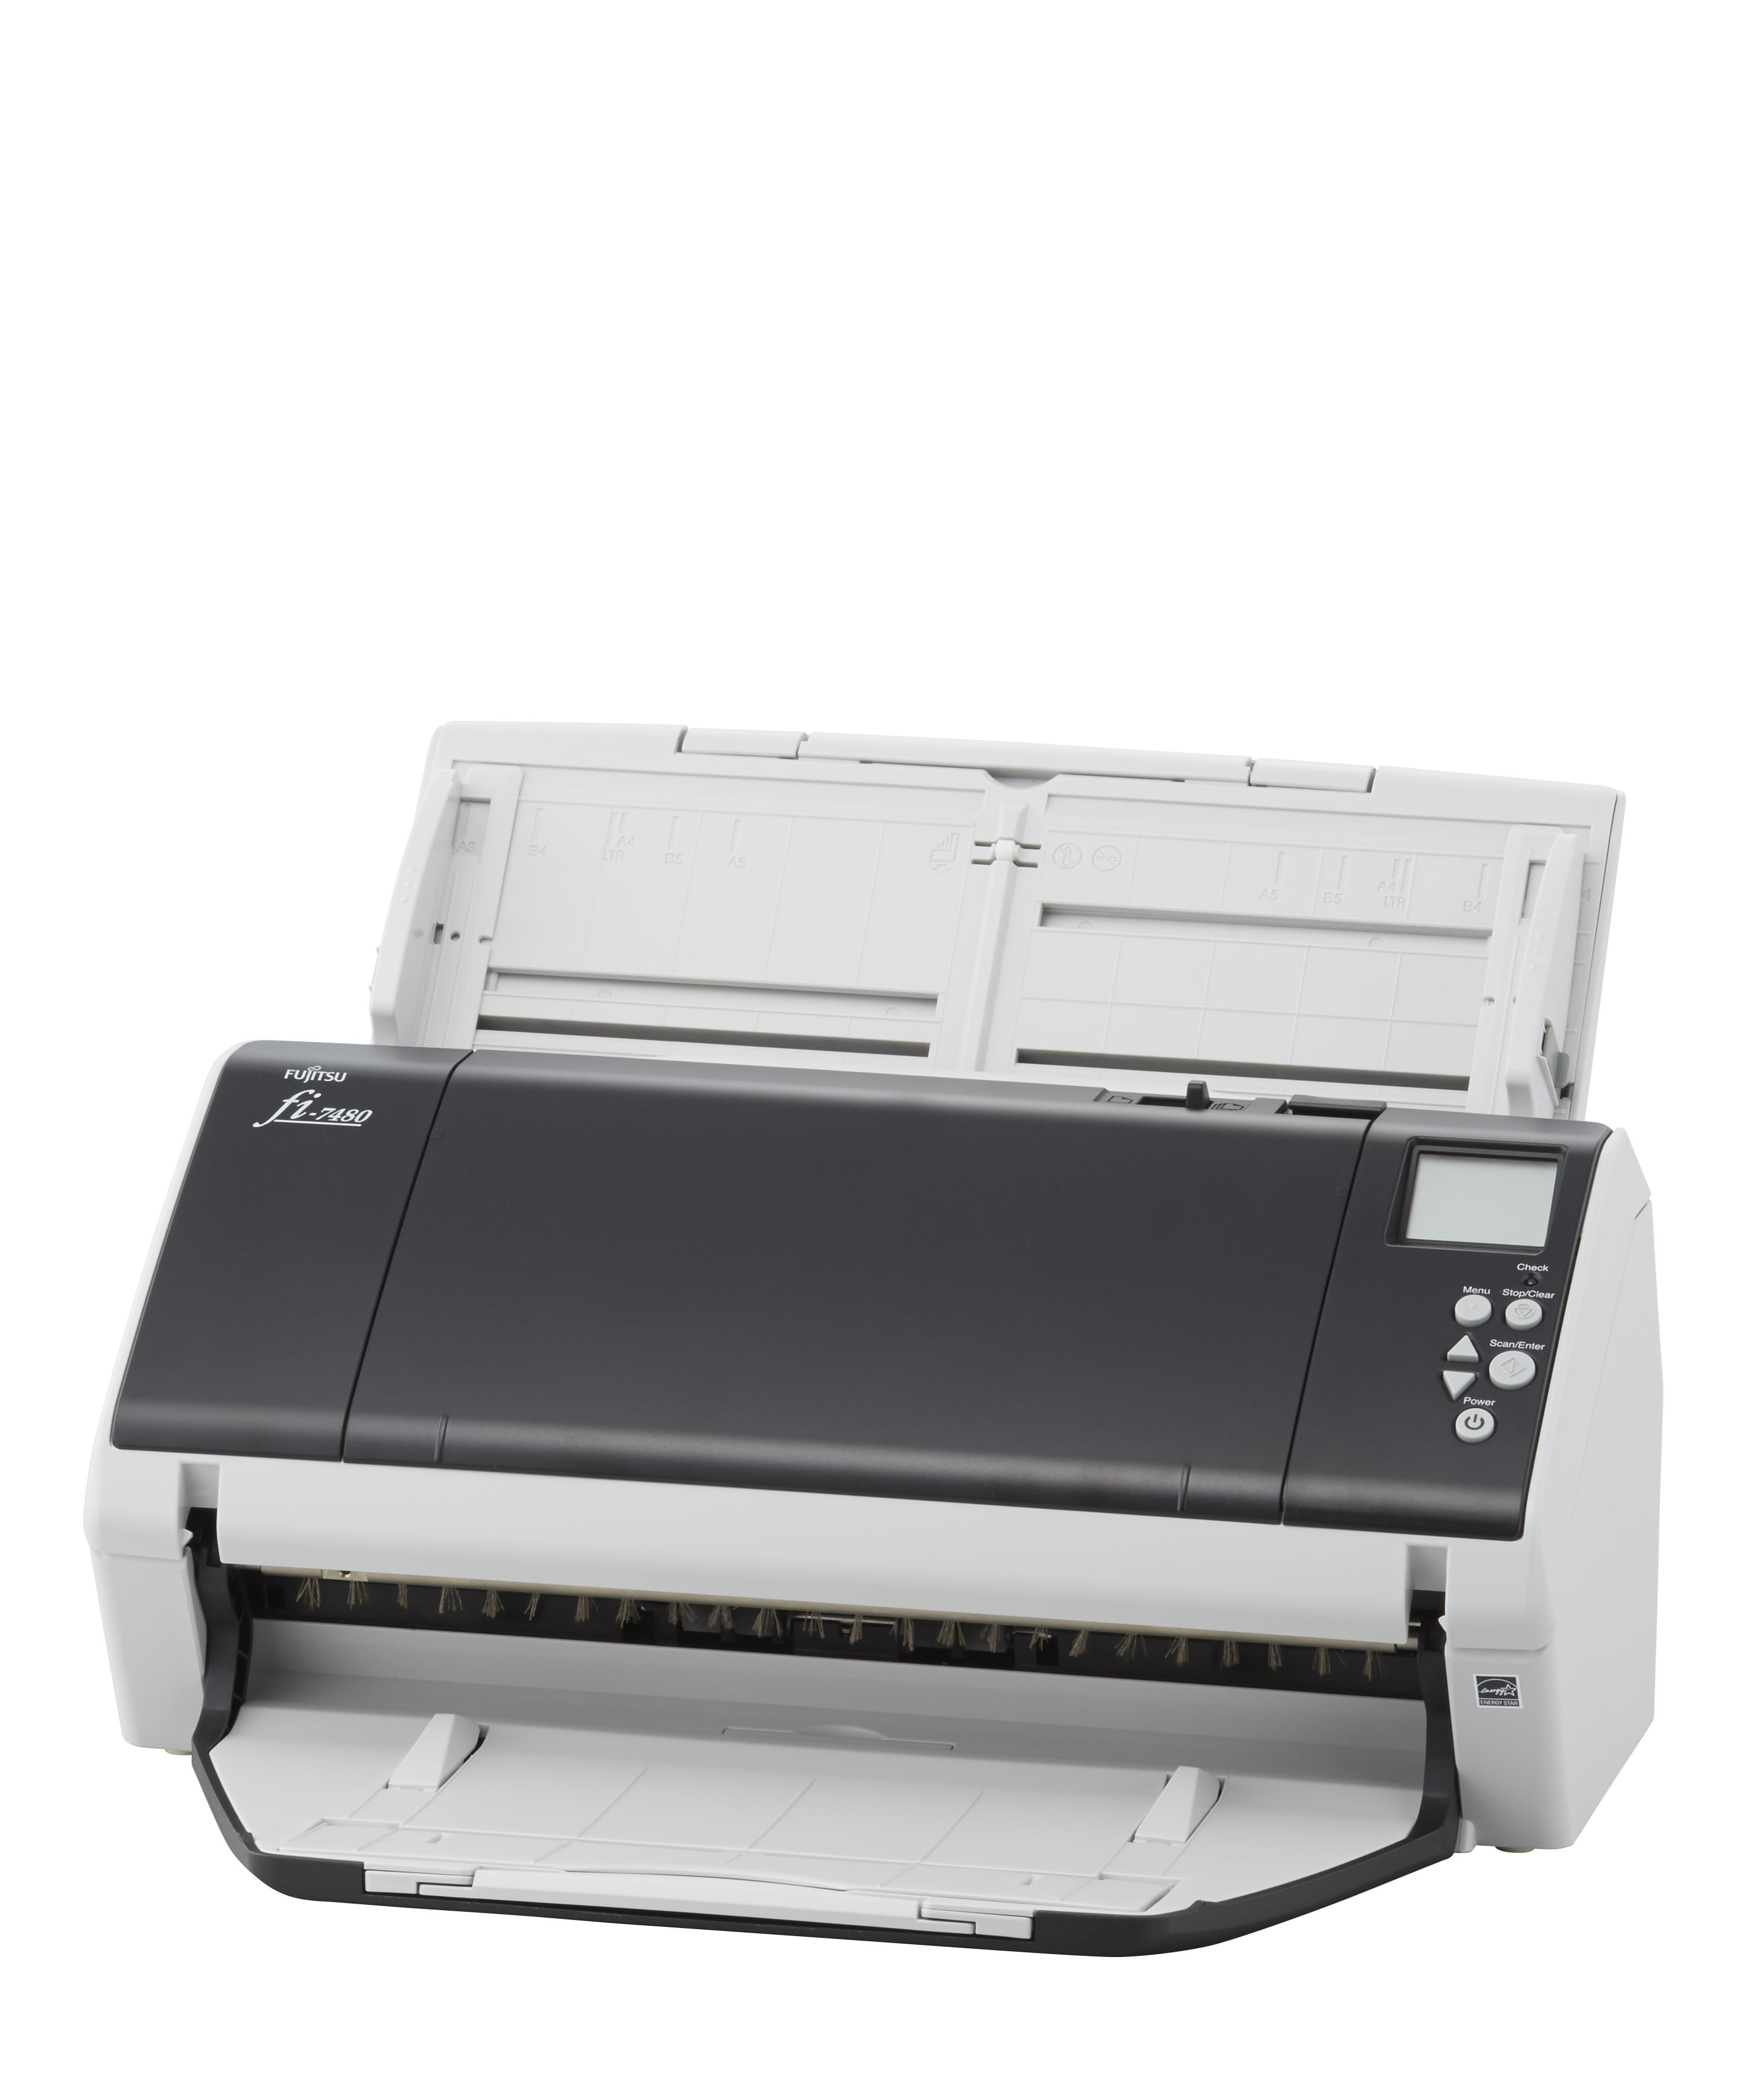 Fujitsu fi-7480 ADF 600 x 600DPI A3 Grey,White